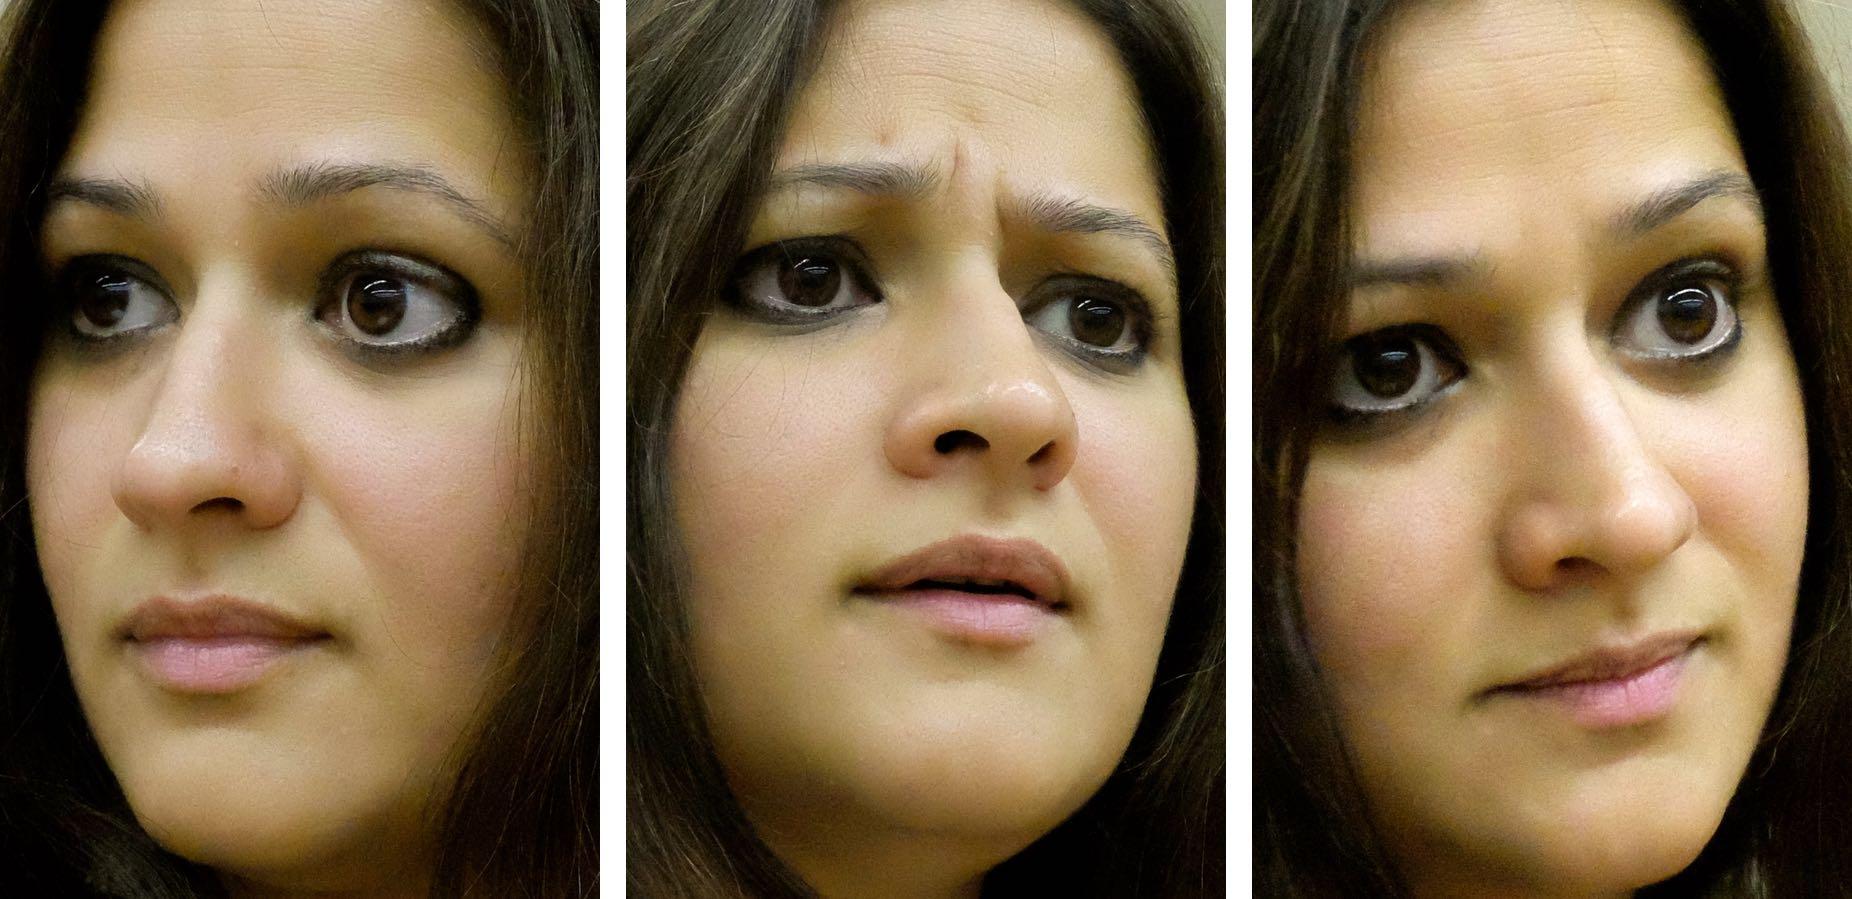 Sindu Singh as Dr. Sonya Labonté